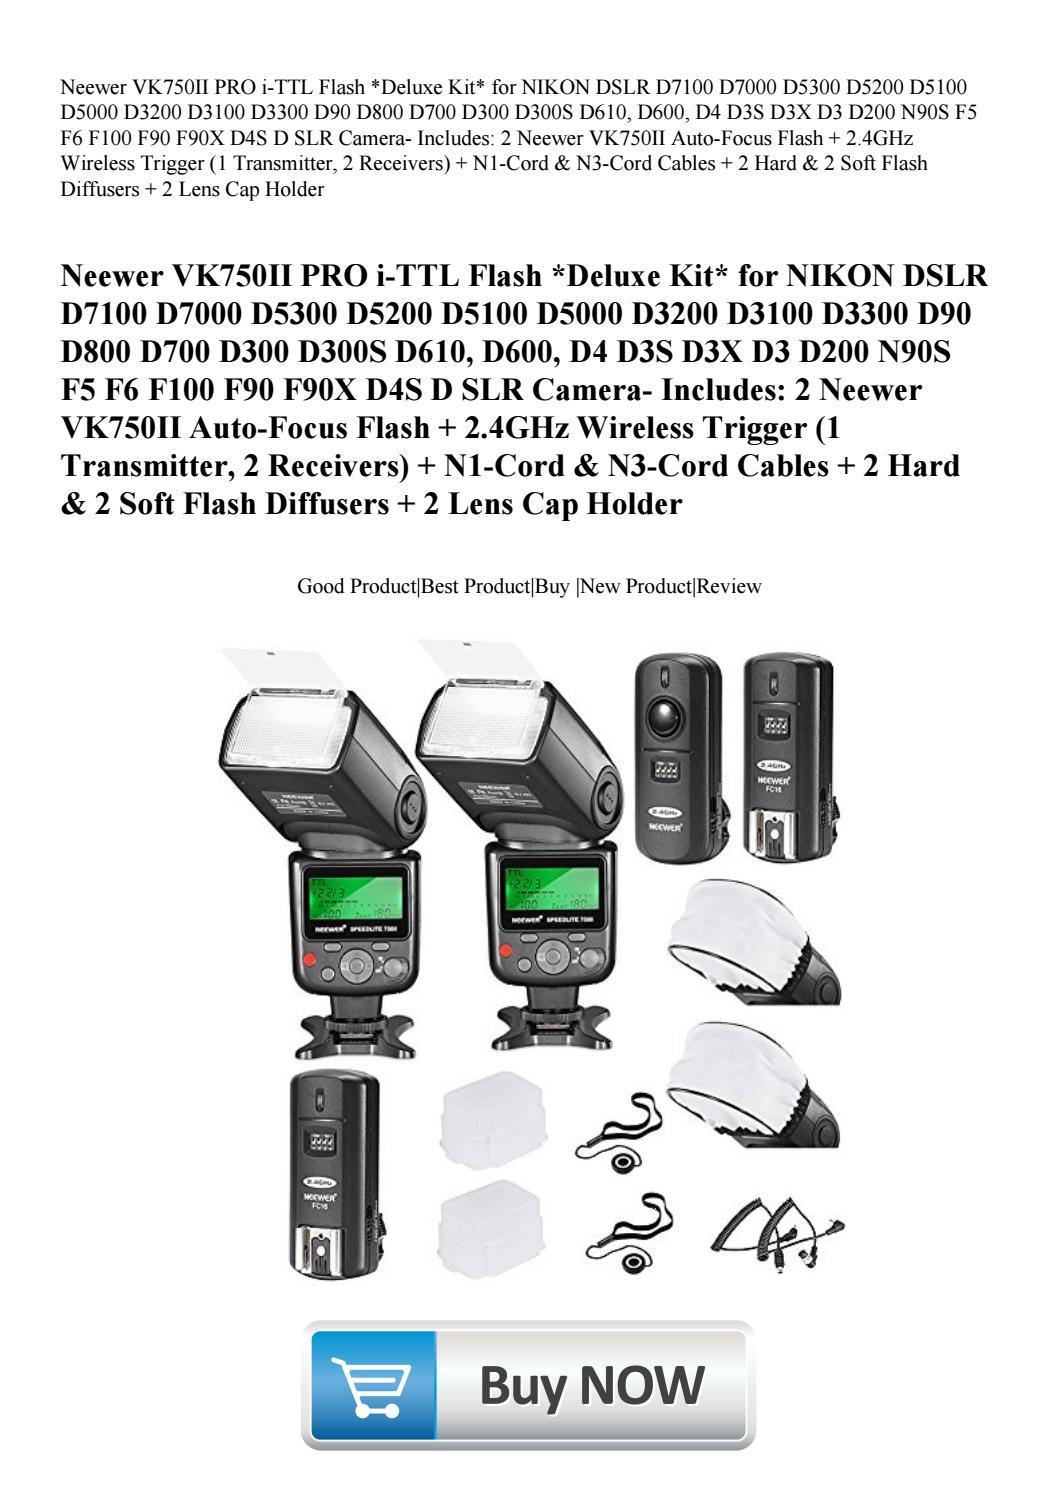 Neewer VK750II PRO i-TTL Flash Deluxe Kit for NIKON DSLR